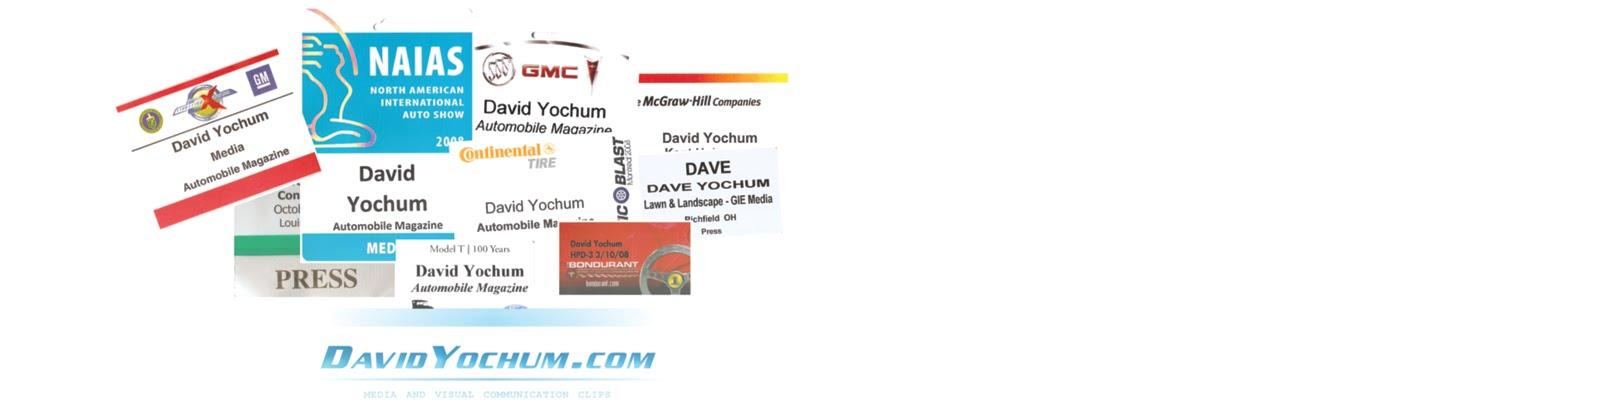 DavidYochum.com